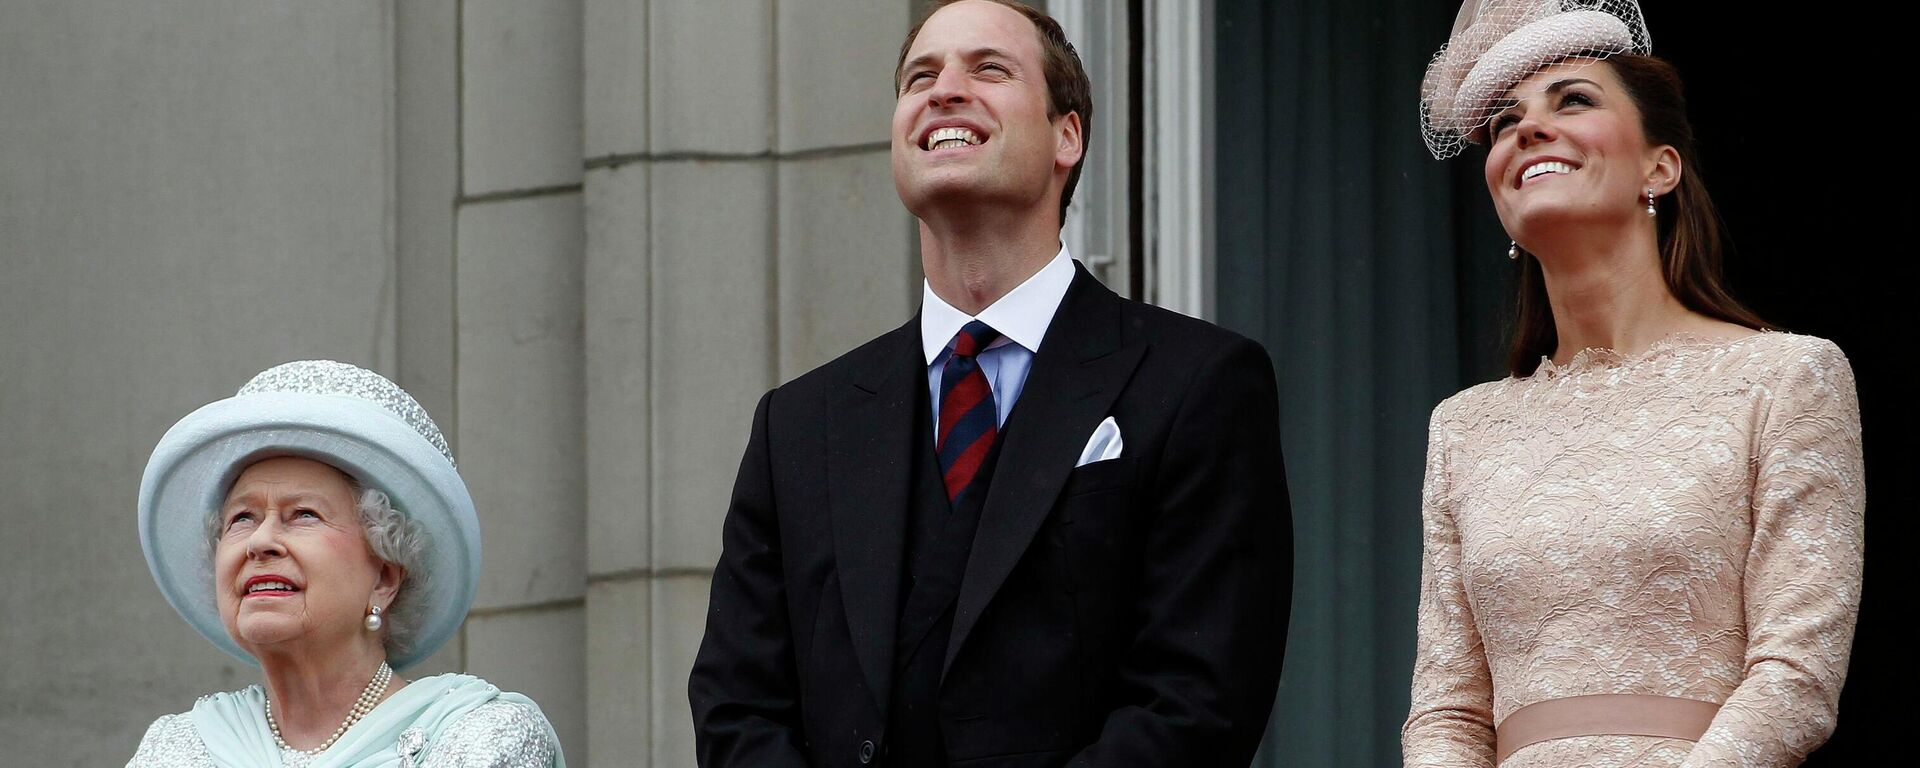 La reina Isabel II junto a William y Kate, en 2012 - Sputnik Mundo, 1920, 08.08.2021